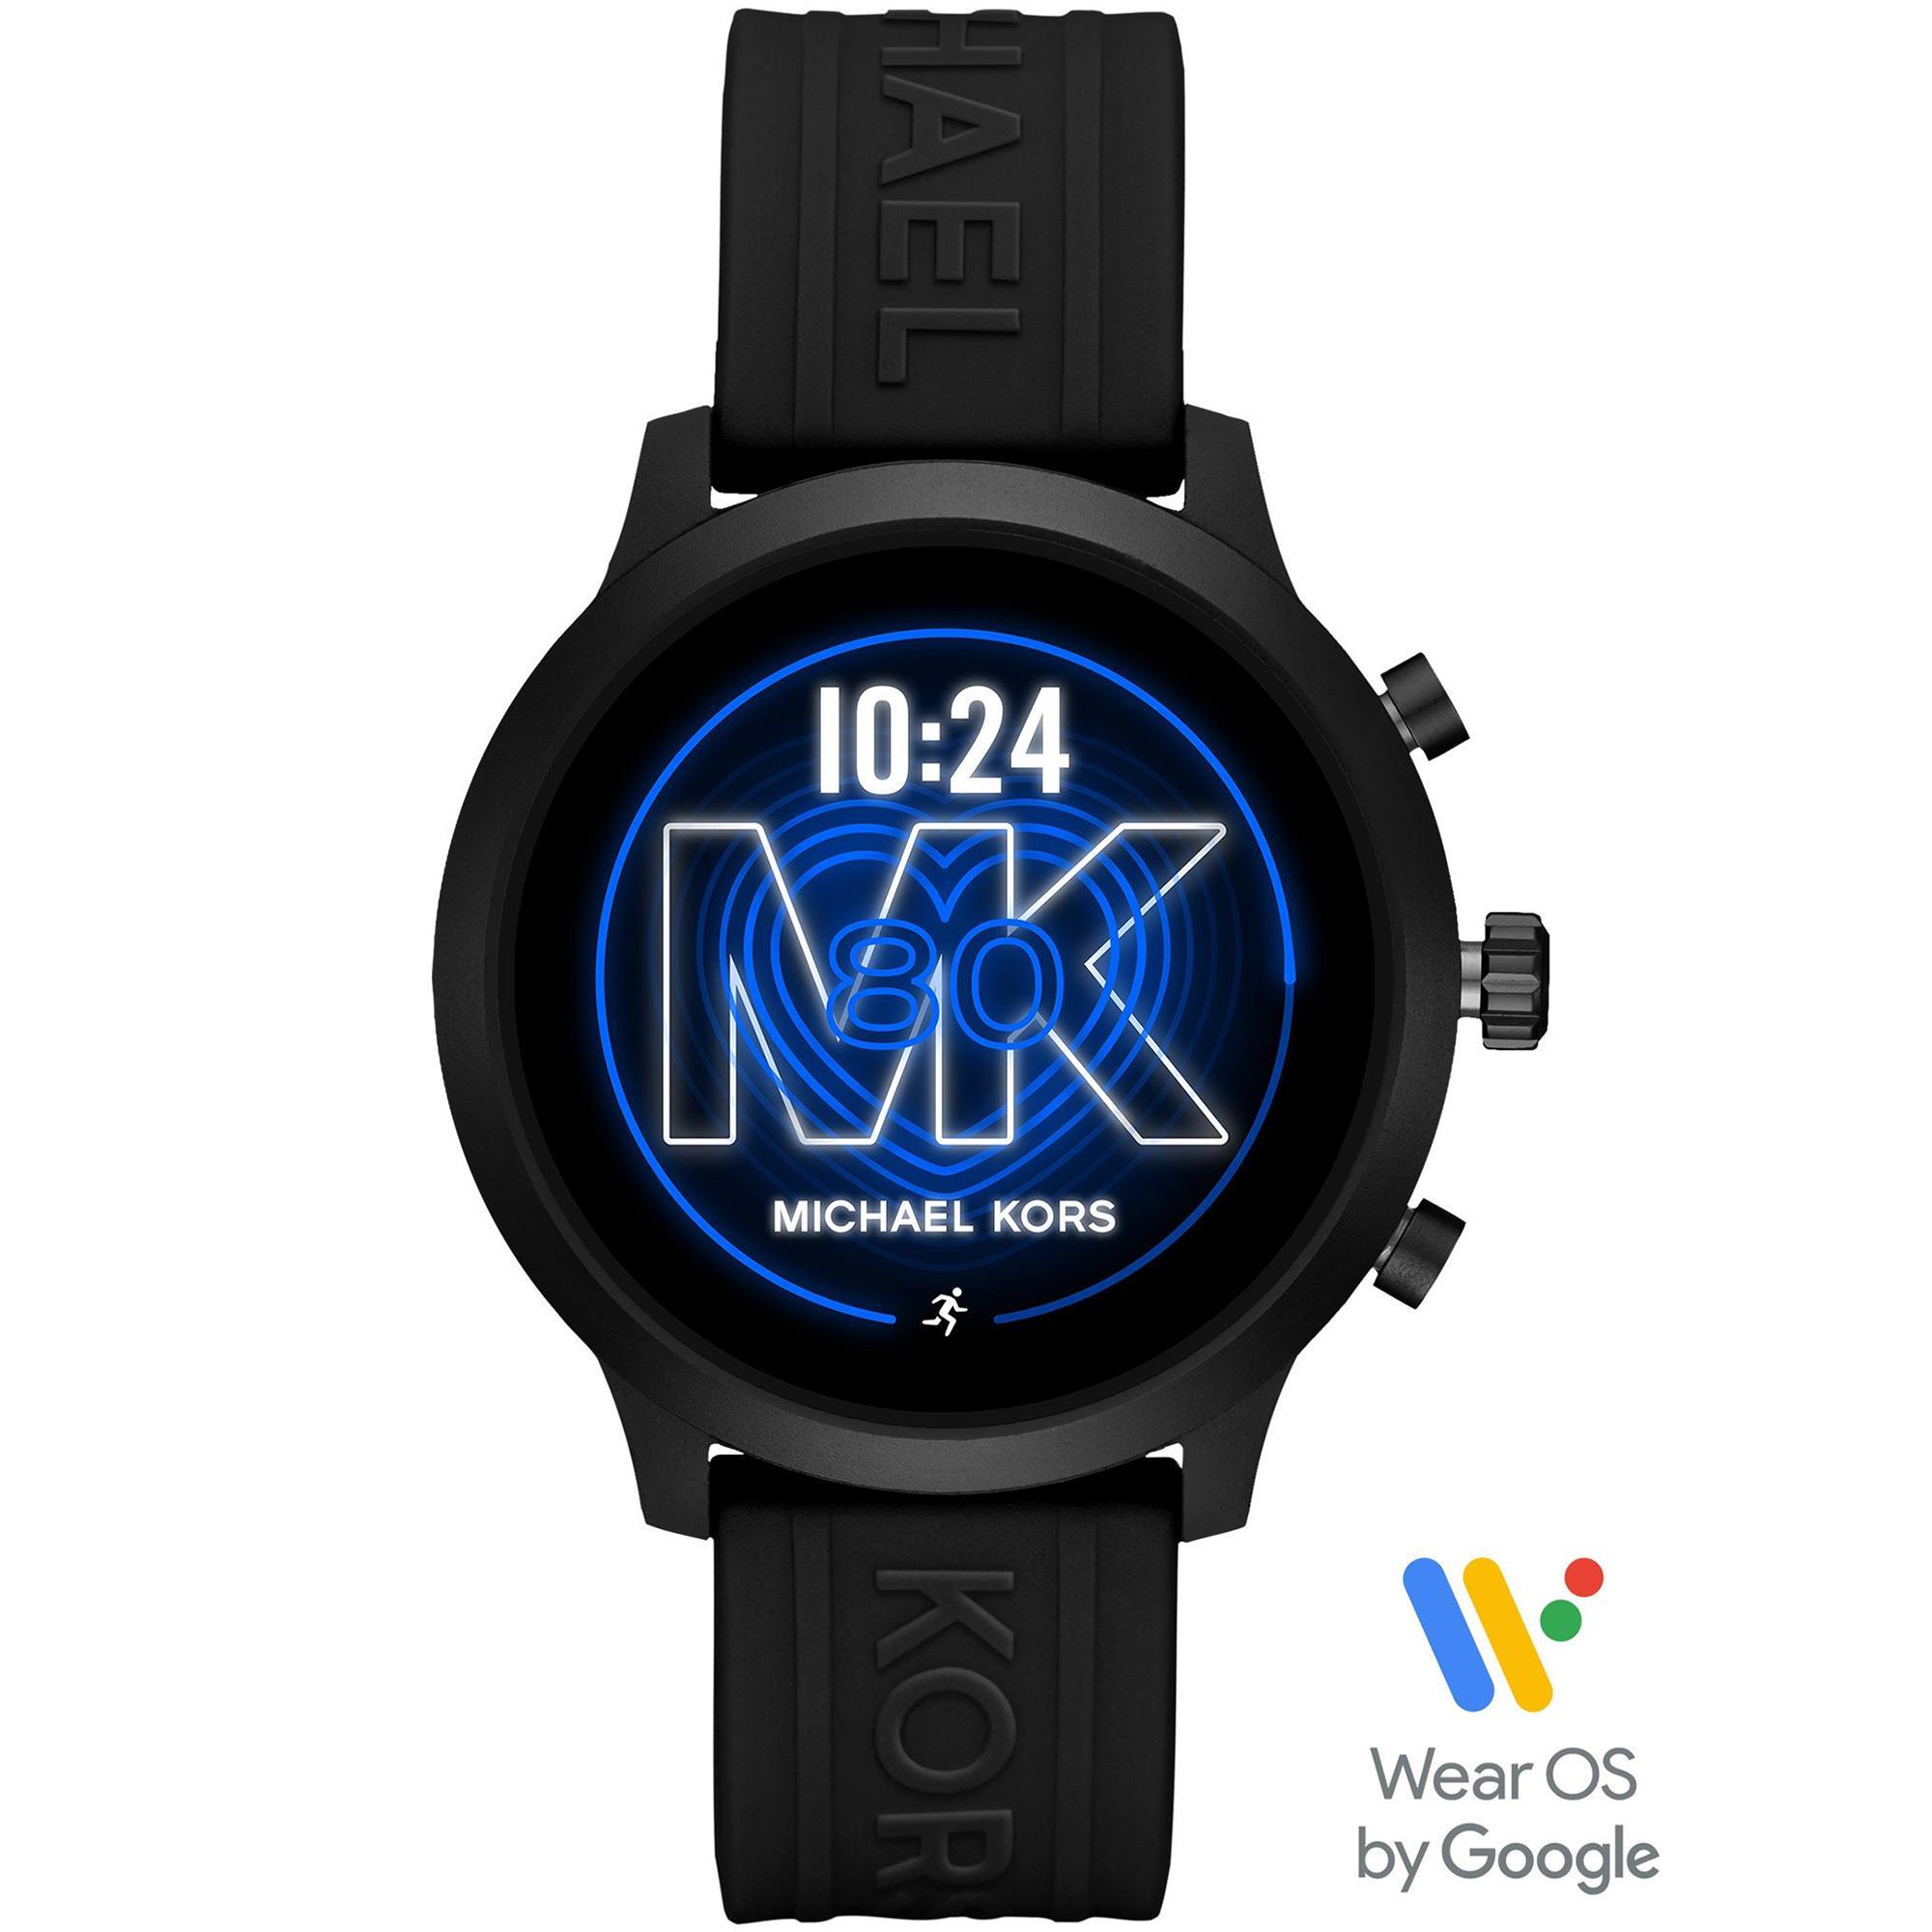 Orologio Smartwatch donna Michael Kors Mkgo - MICHAEL KORS